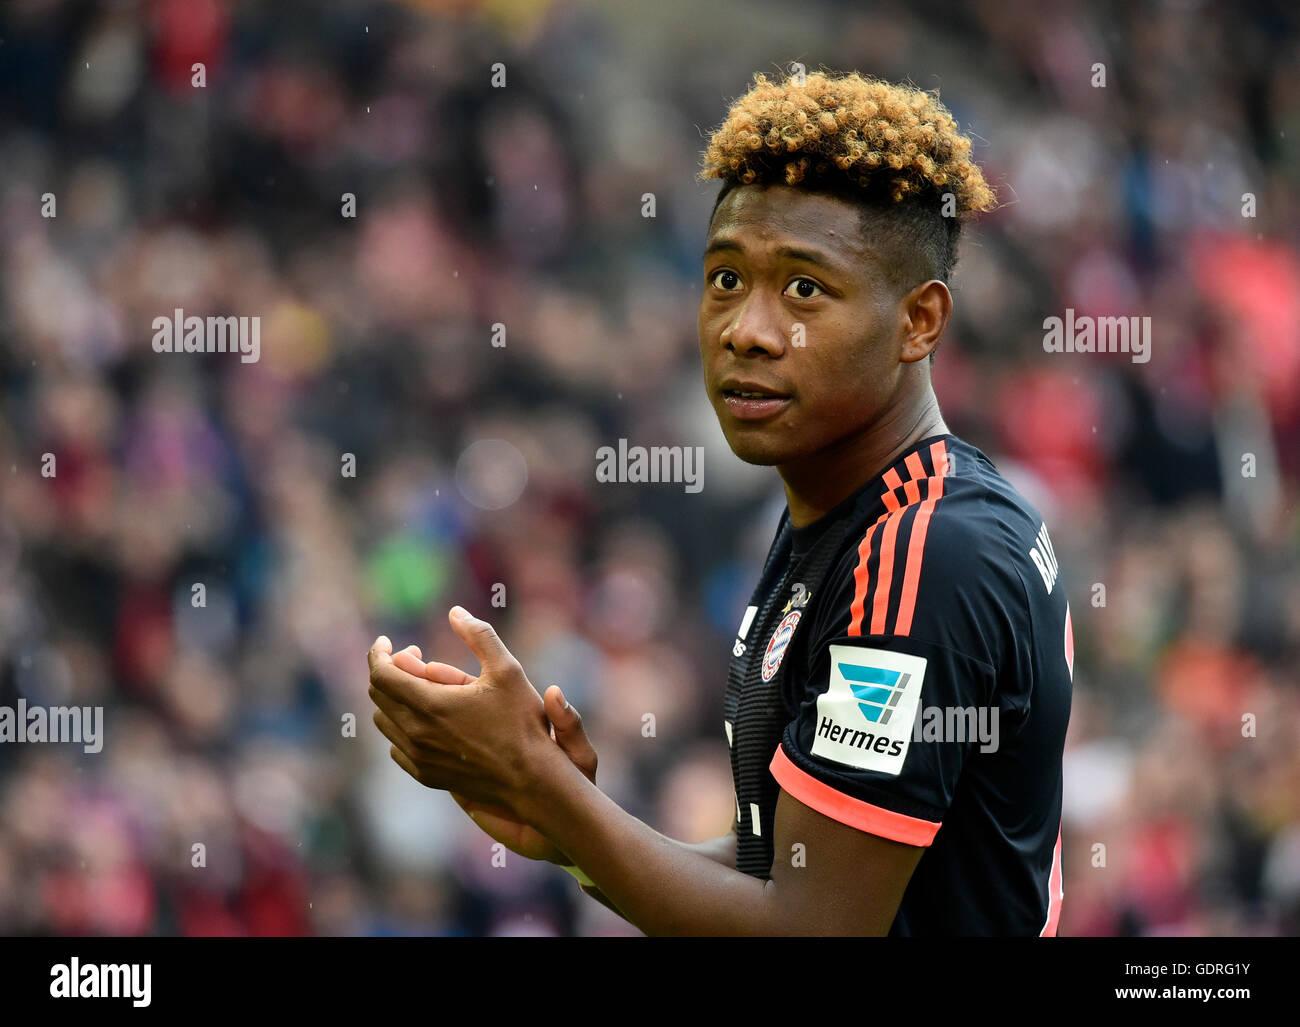 David Alaba Soccer Player at FC Bayern Munich Stuttgart Stock